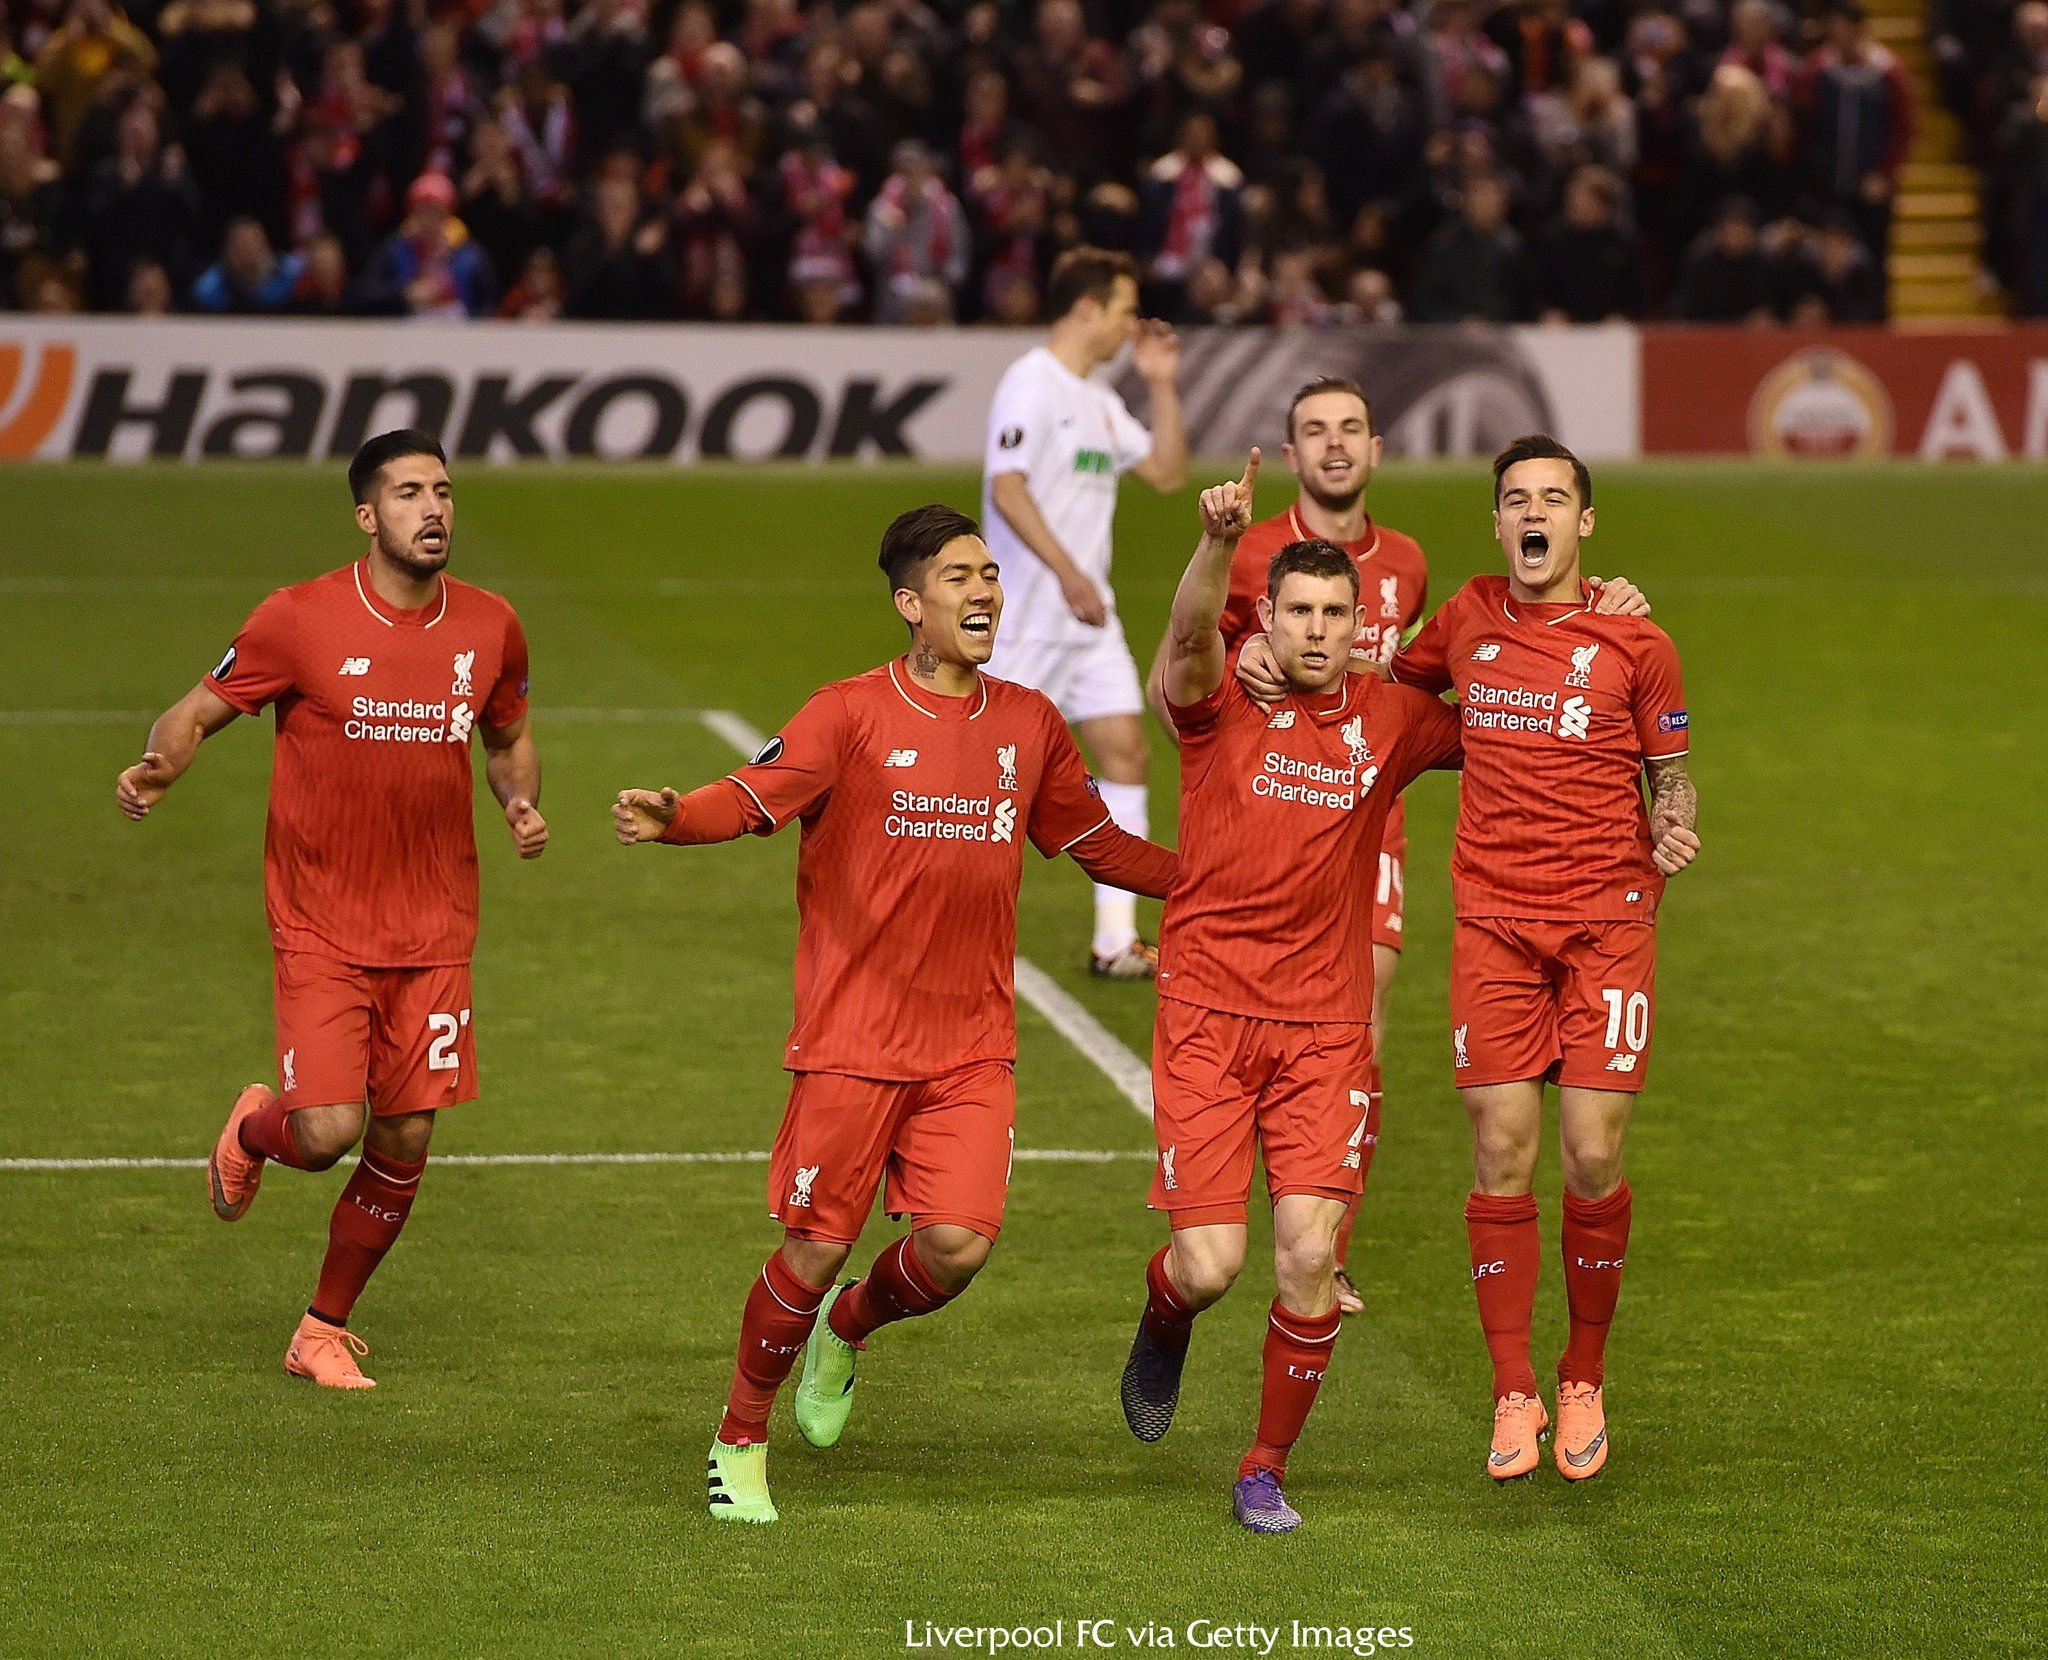 Pin on Liverpool Football Club & Anfield Stadium